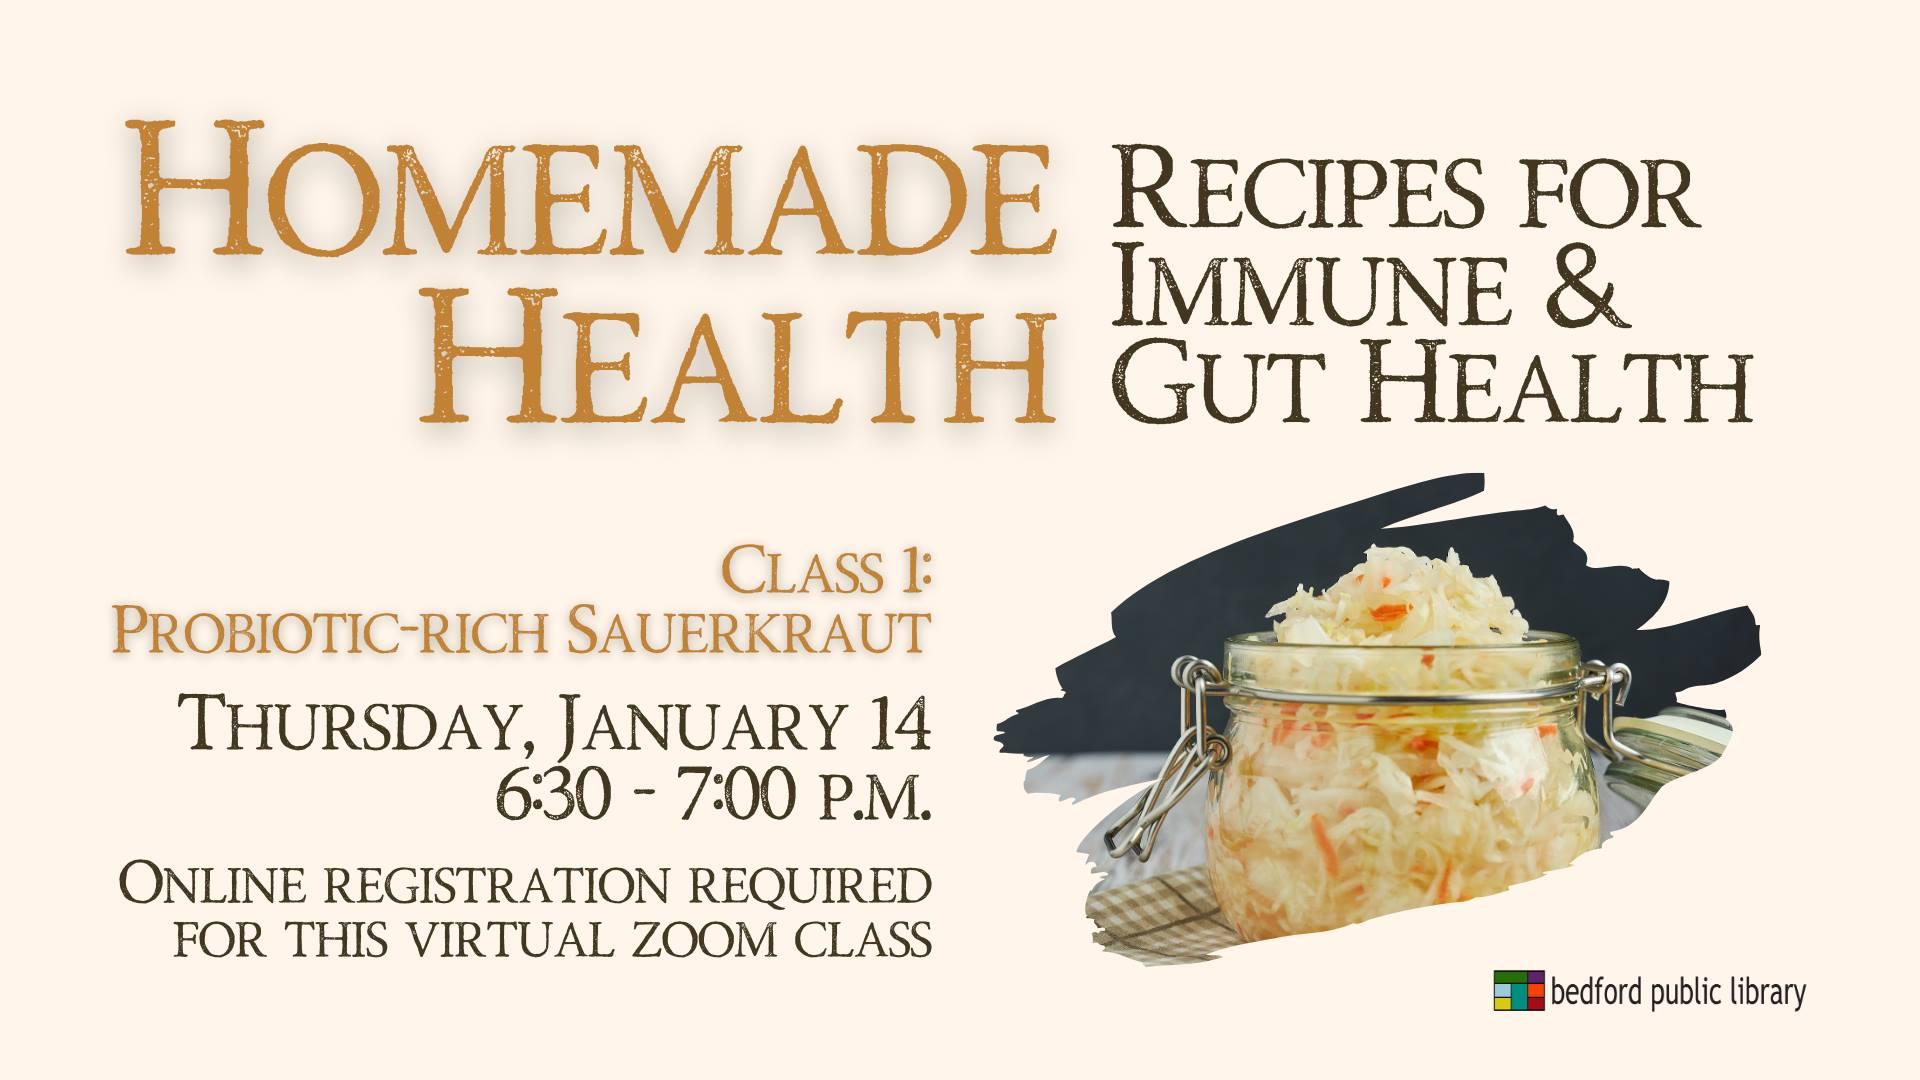 Homemade Health: Recipes for Immune & Gut Health